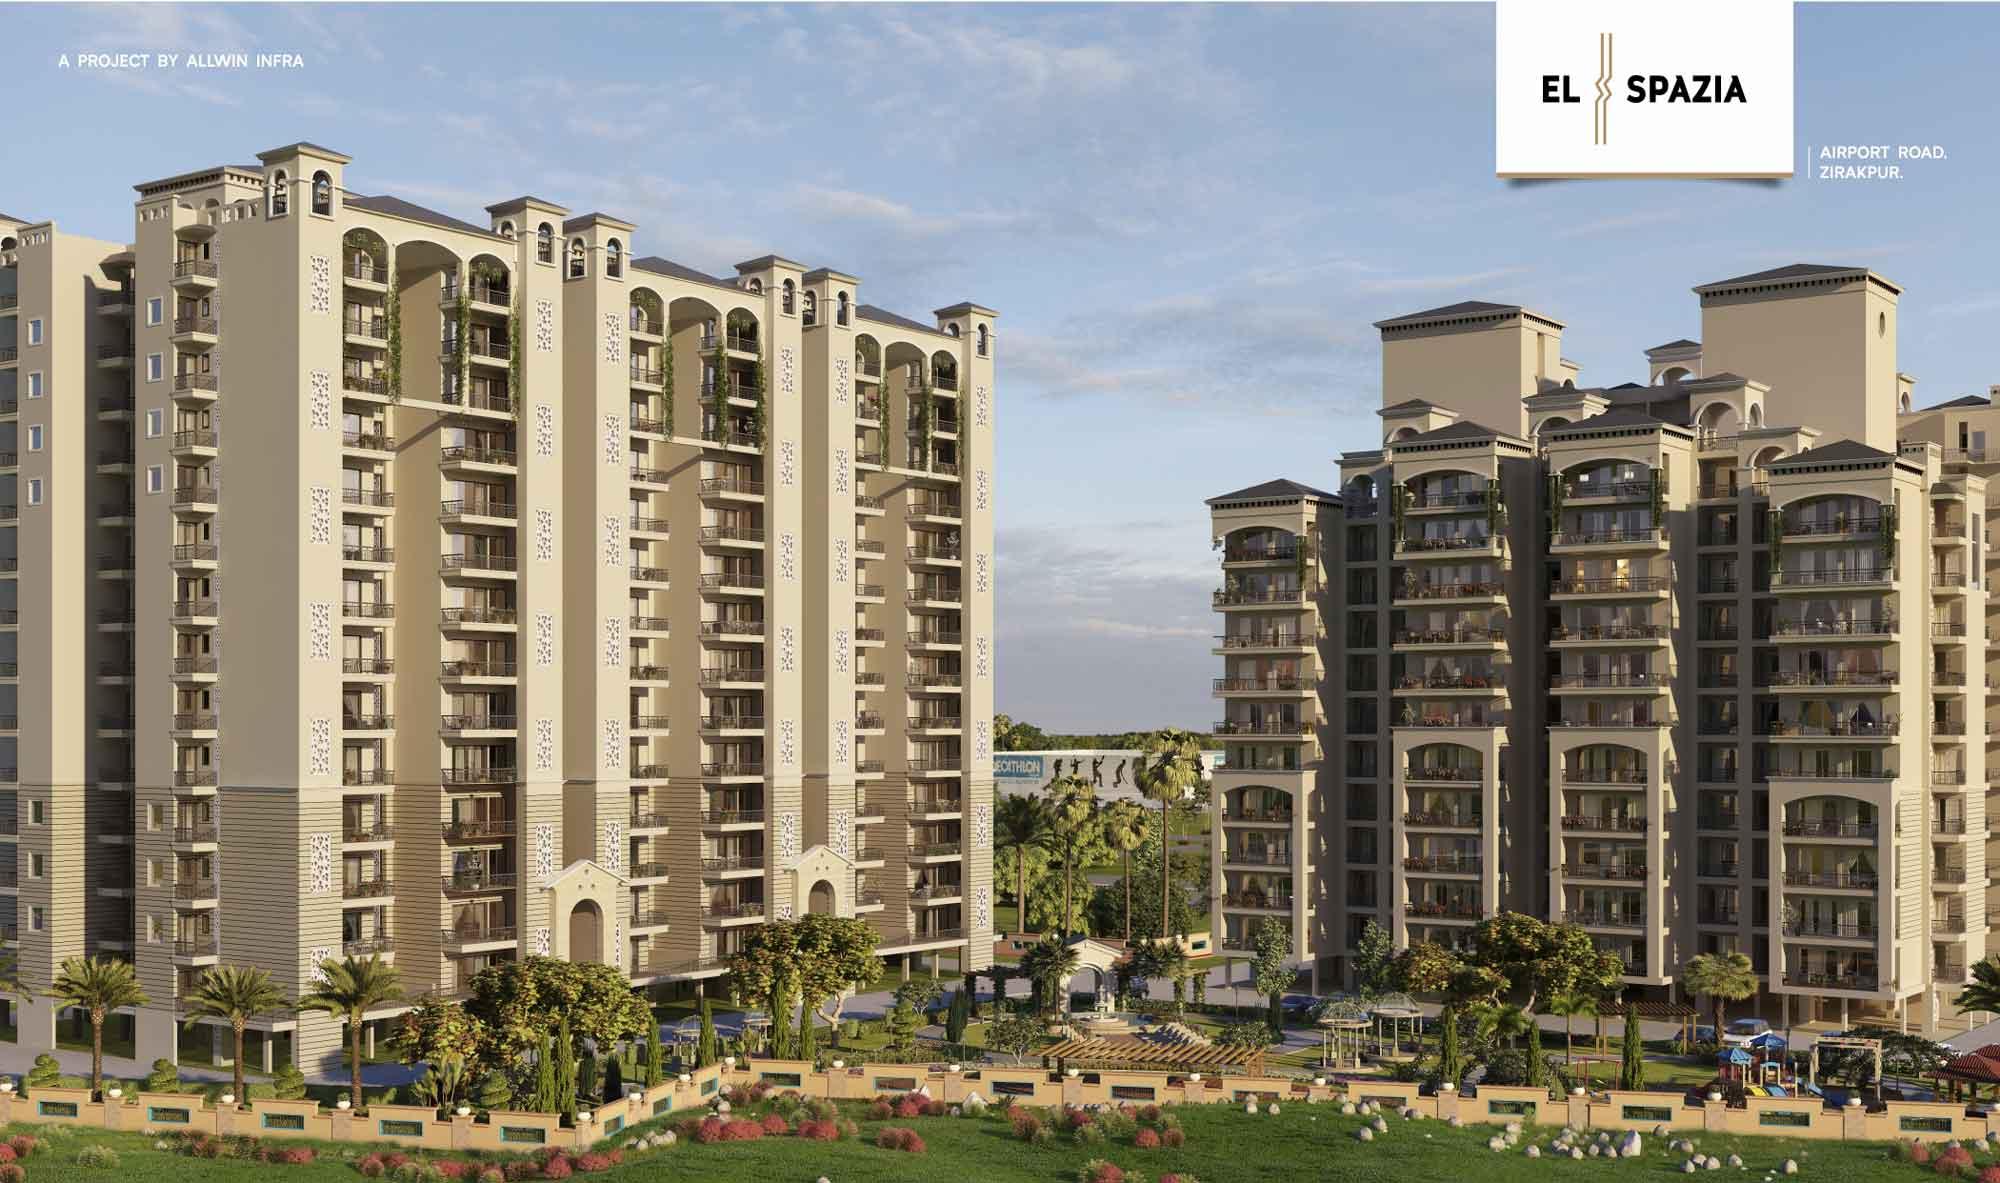 3 bhk flats for sale in zirakpur